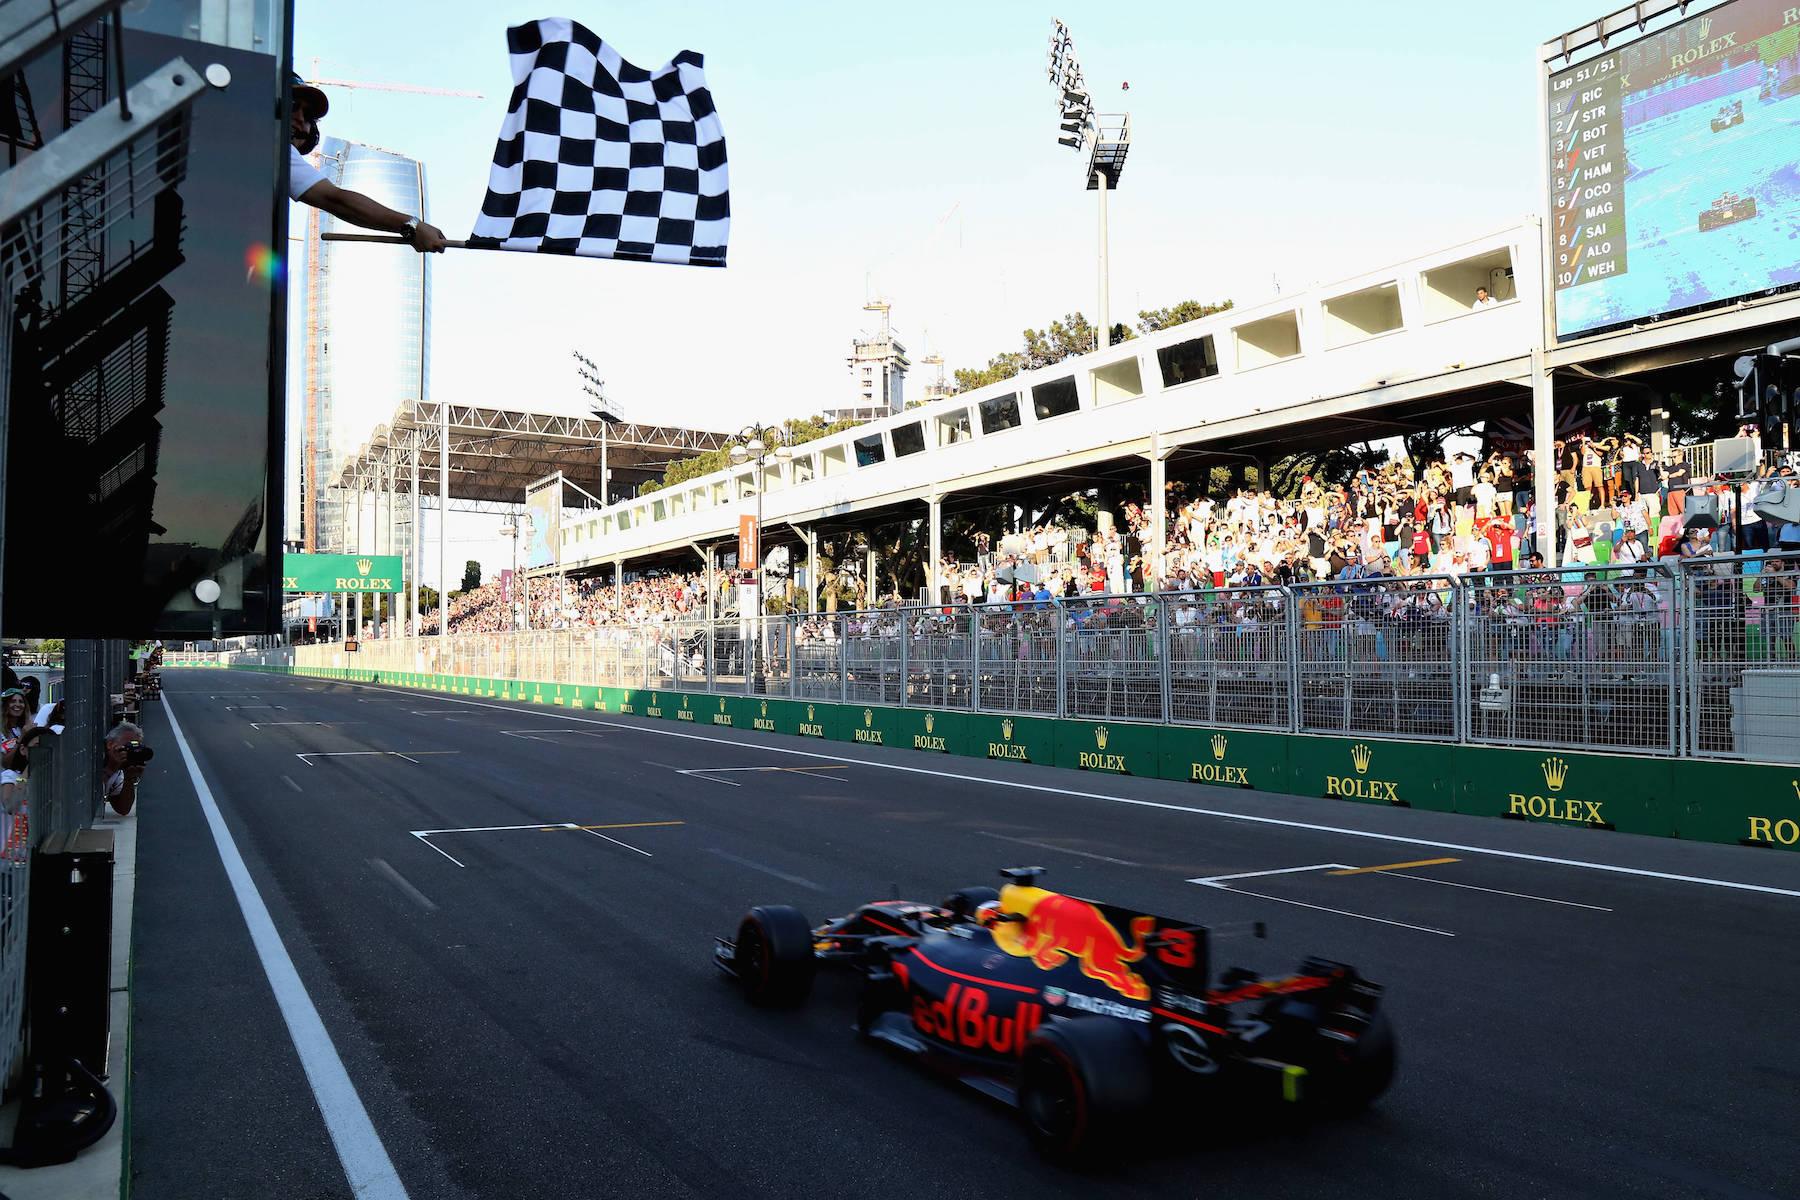 T 2017 Daniel Ricciardo | Red Bull RB13 | 2017 Azerbaijan GP P1 1 copy.jpg